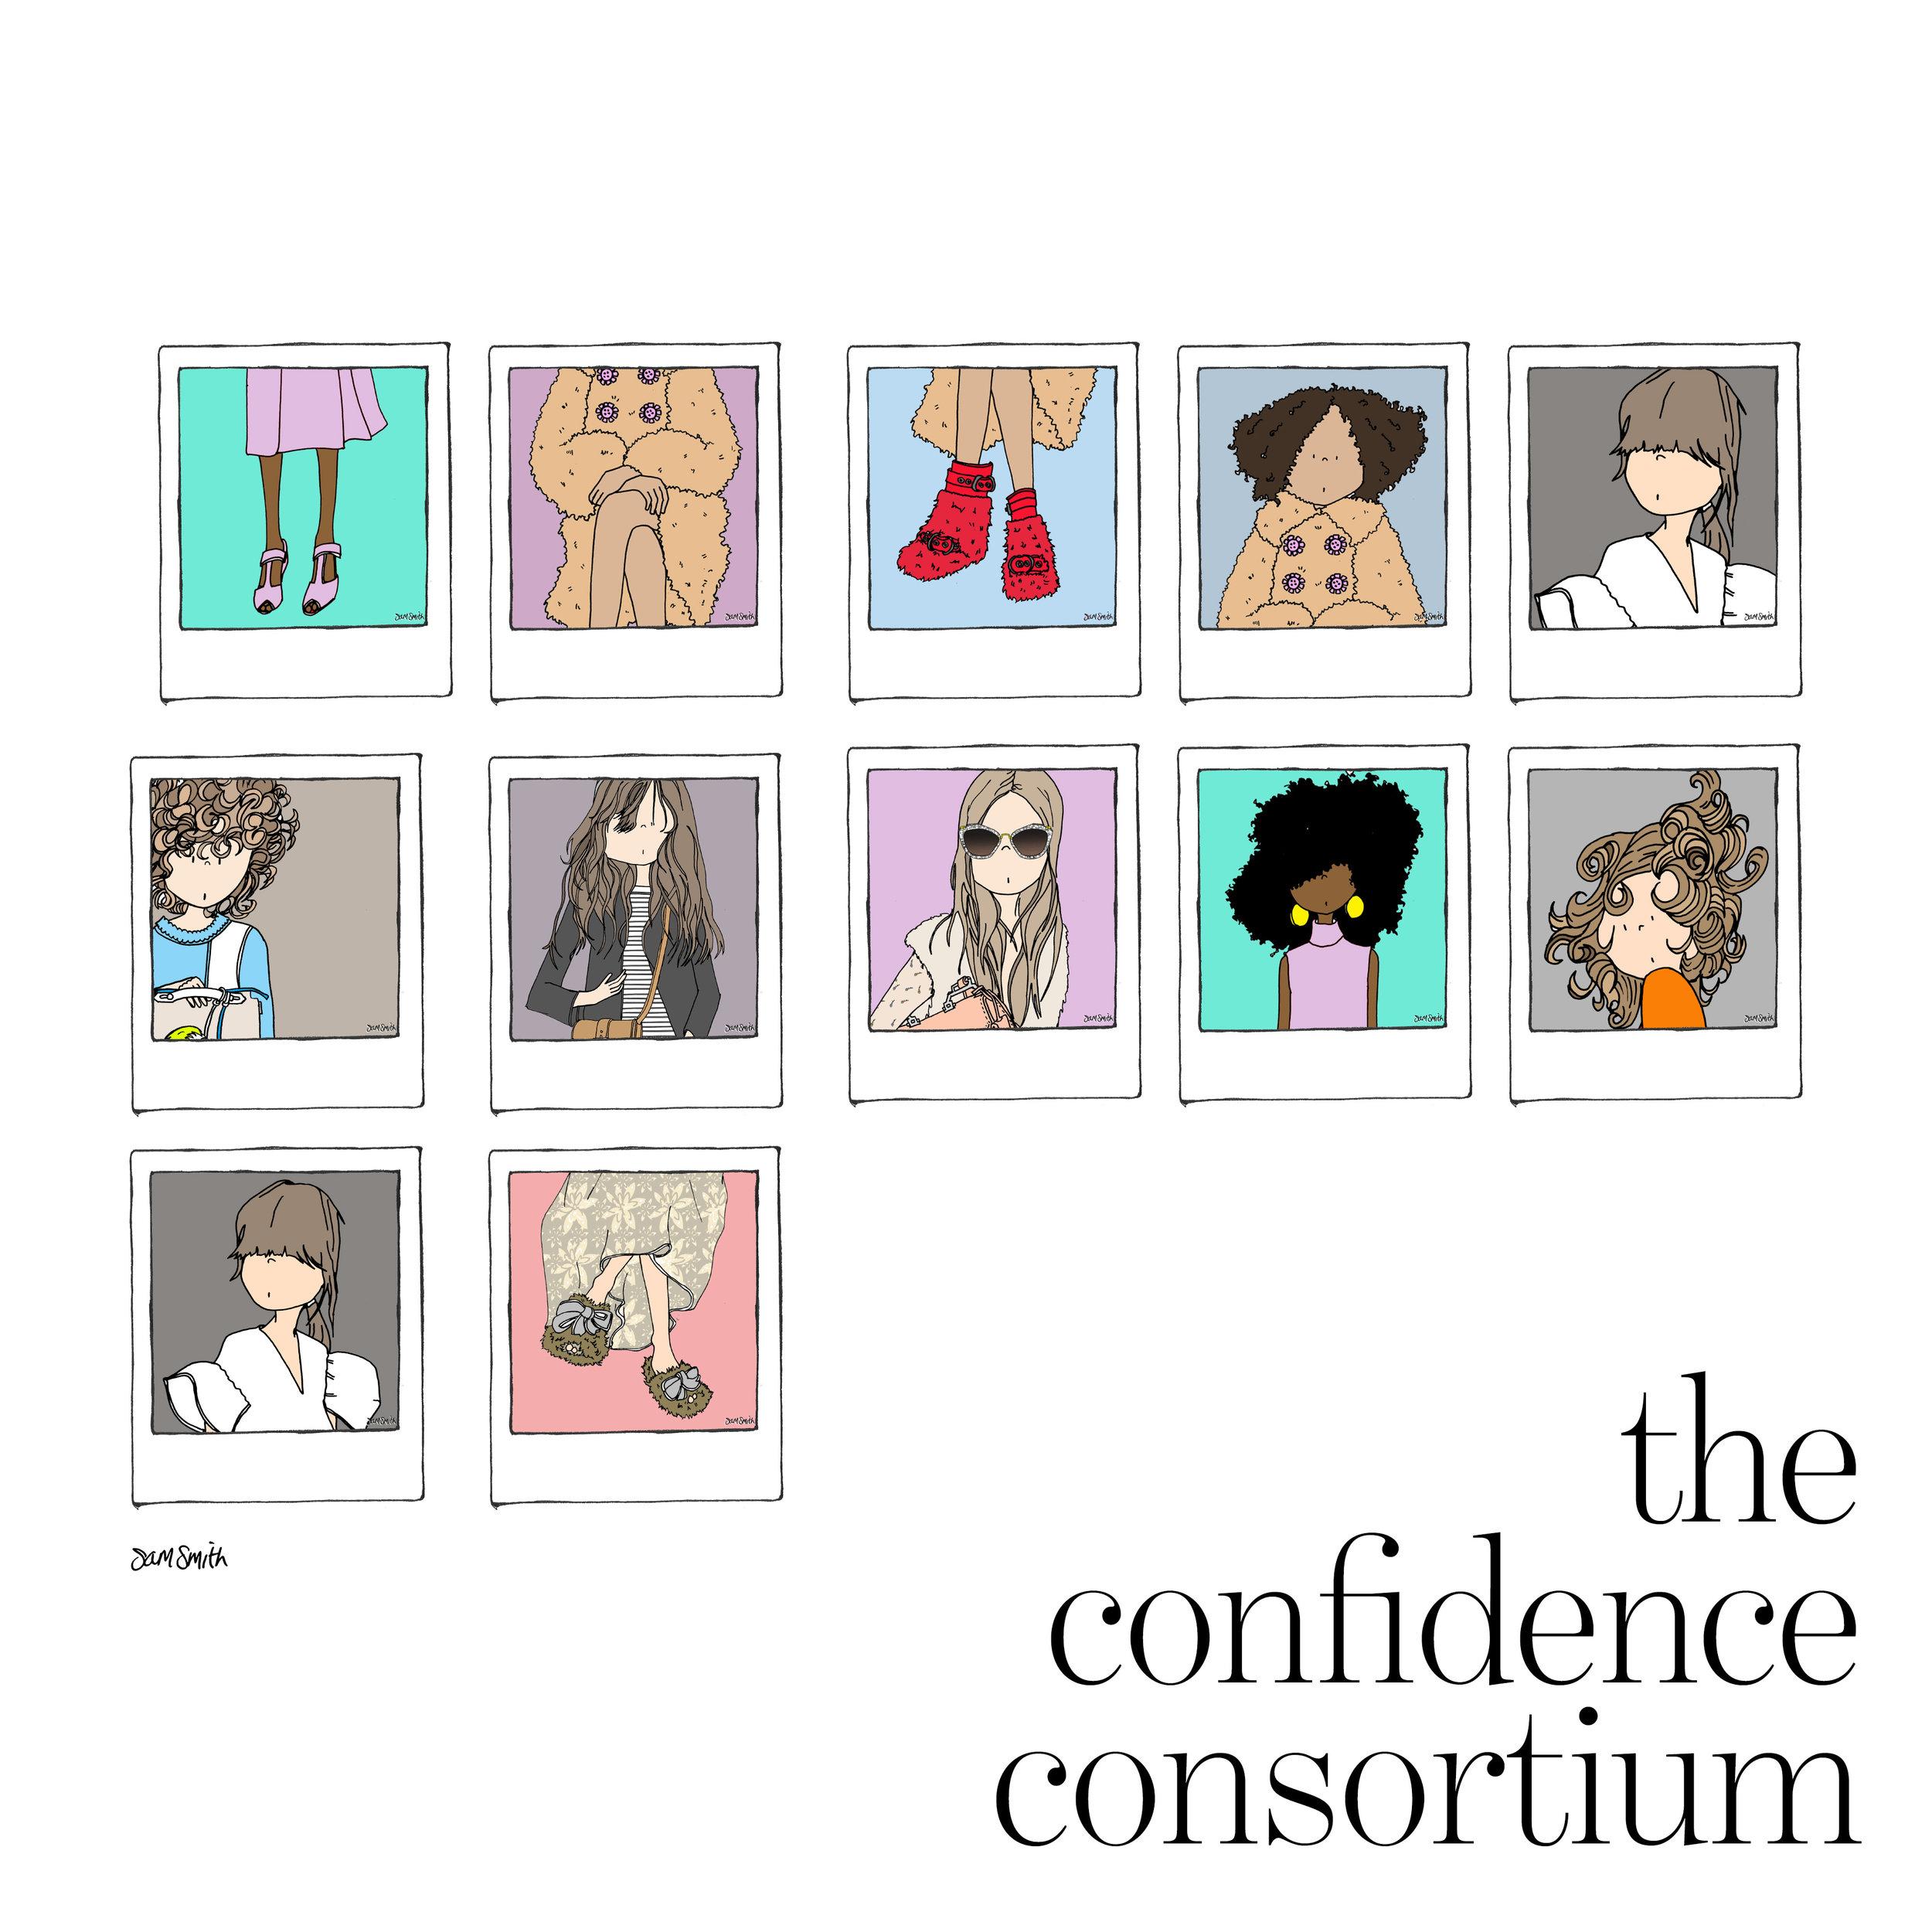 the confidence consortium 1.jpg